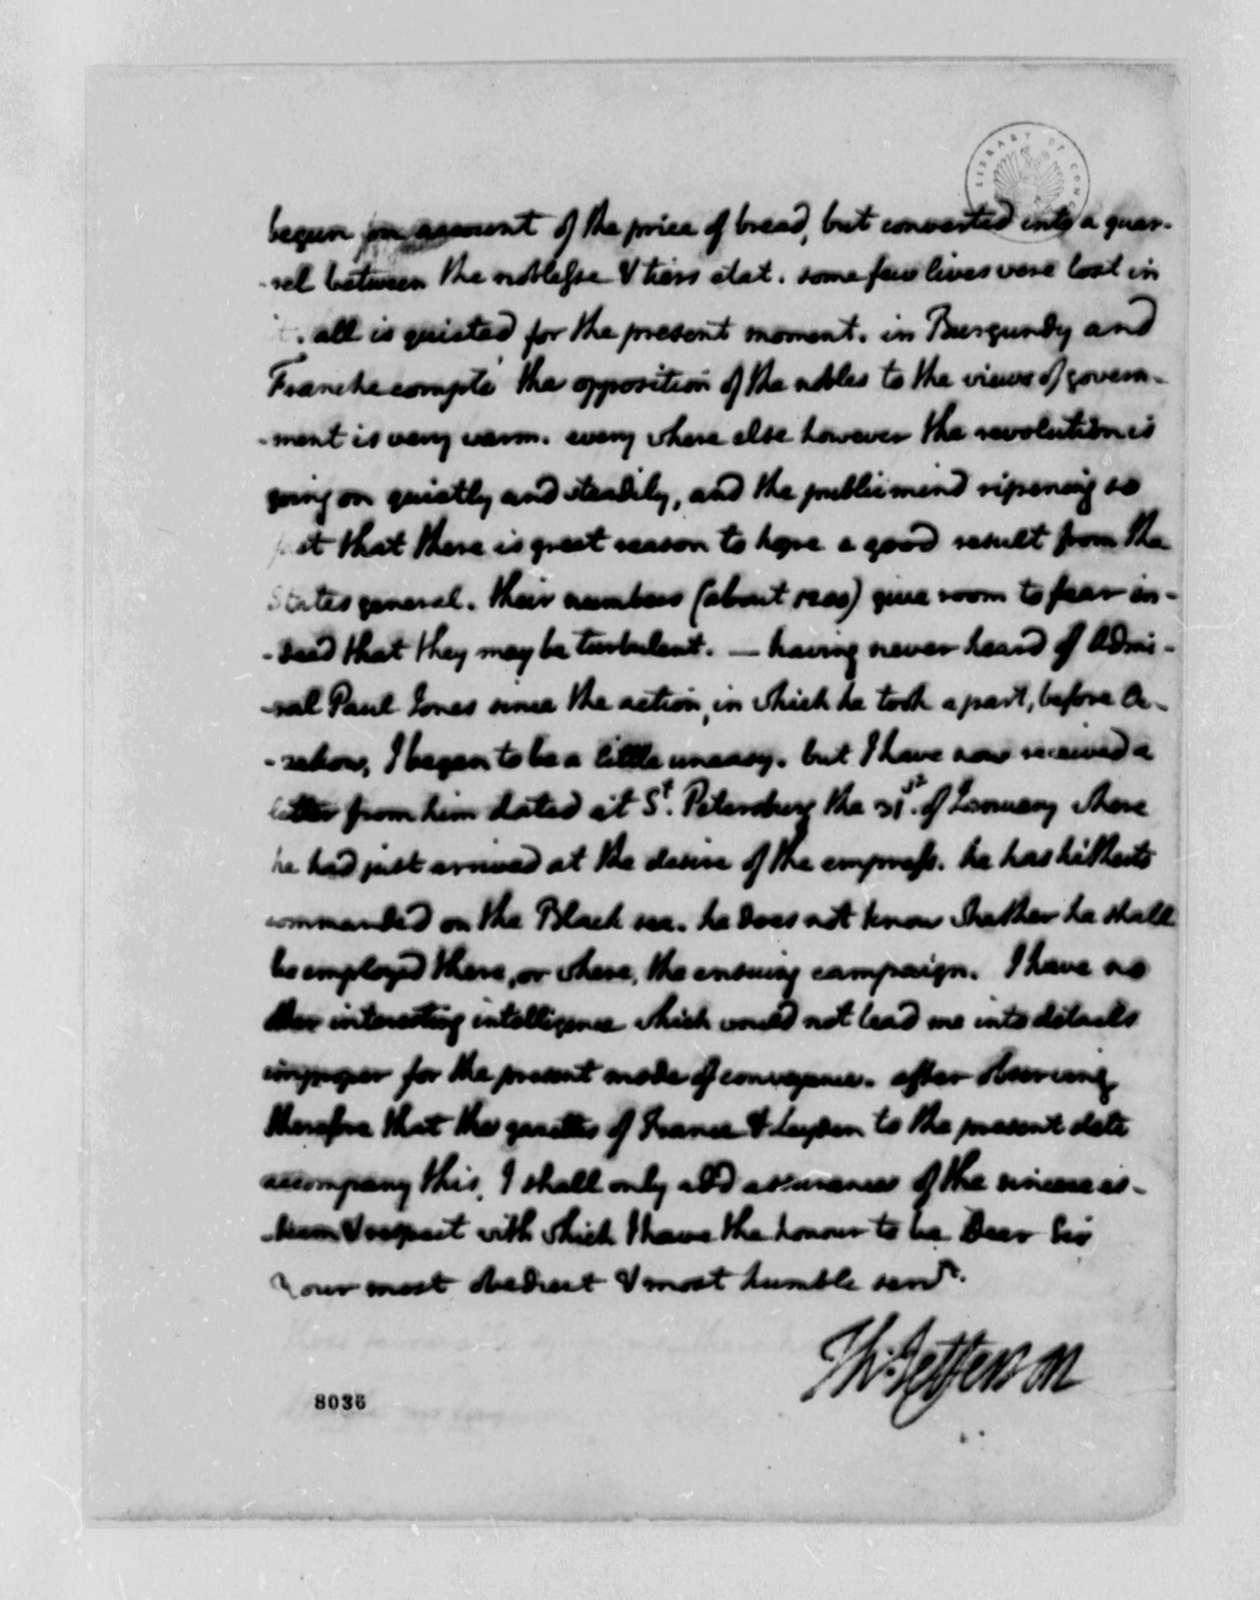 Thomas Jefferson to John Jay, March 1, 1789